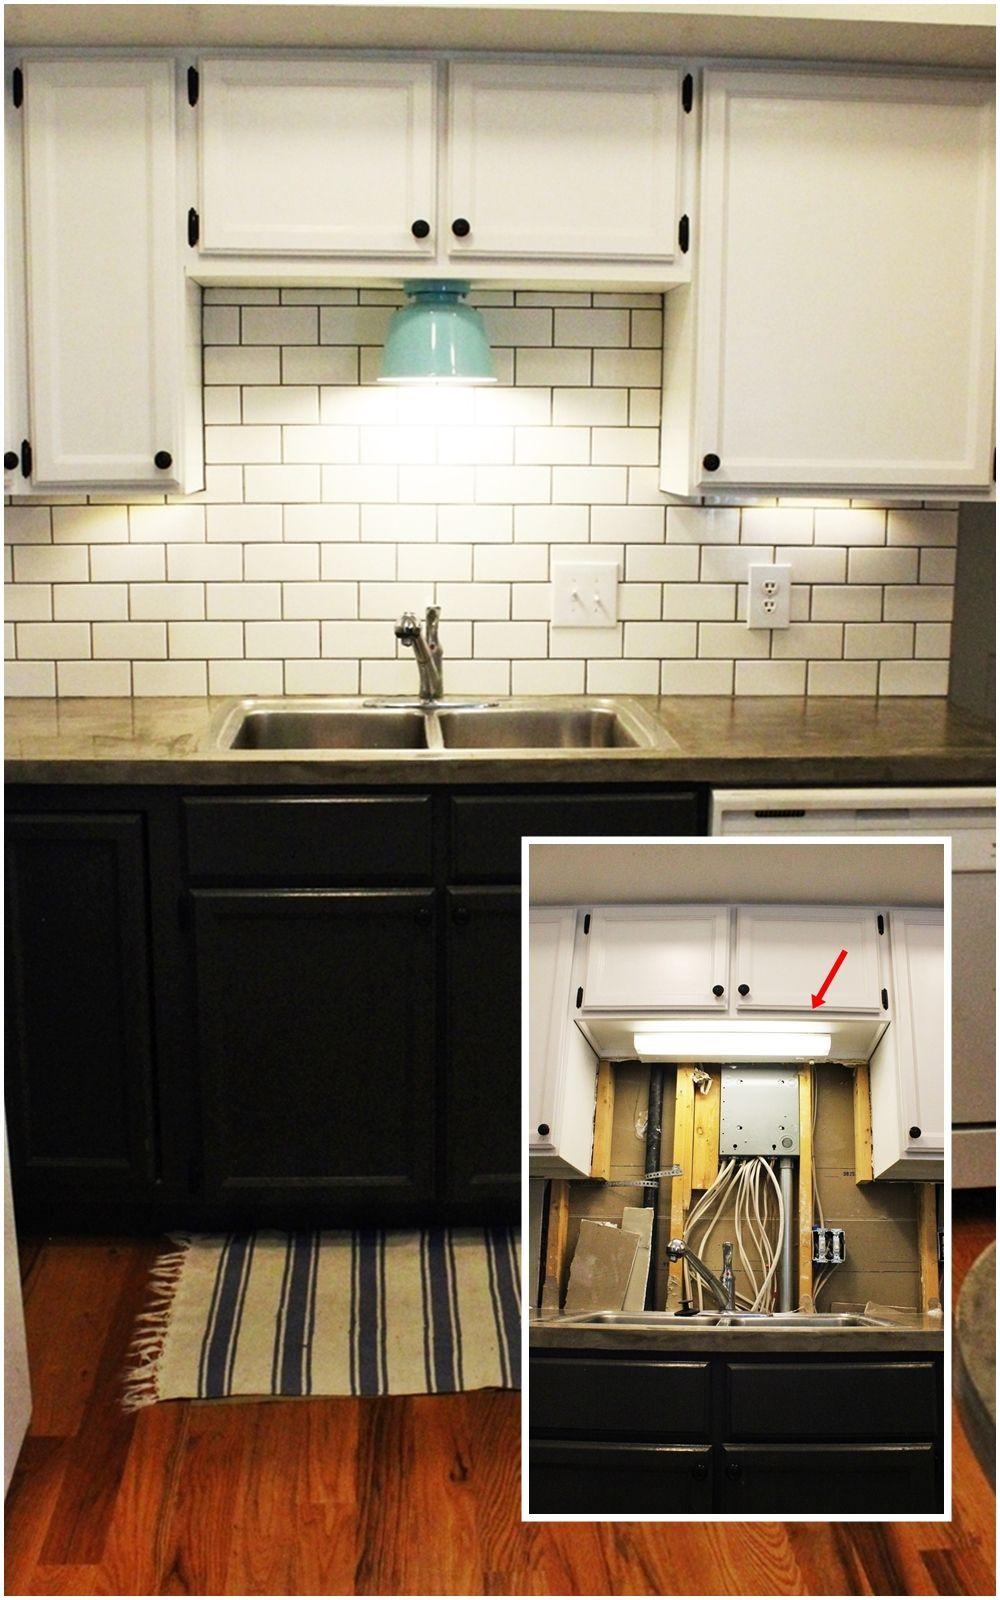 diy kitchen lighting upgrade kitchen cabinet lights DIY Kitchen Lighting Upgrade LED Under Cabinet Lights Above the Sink Light